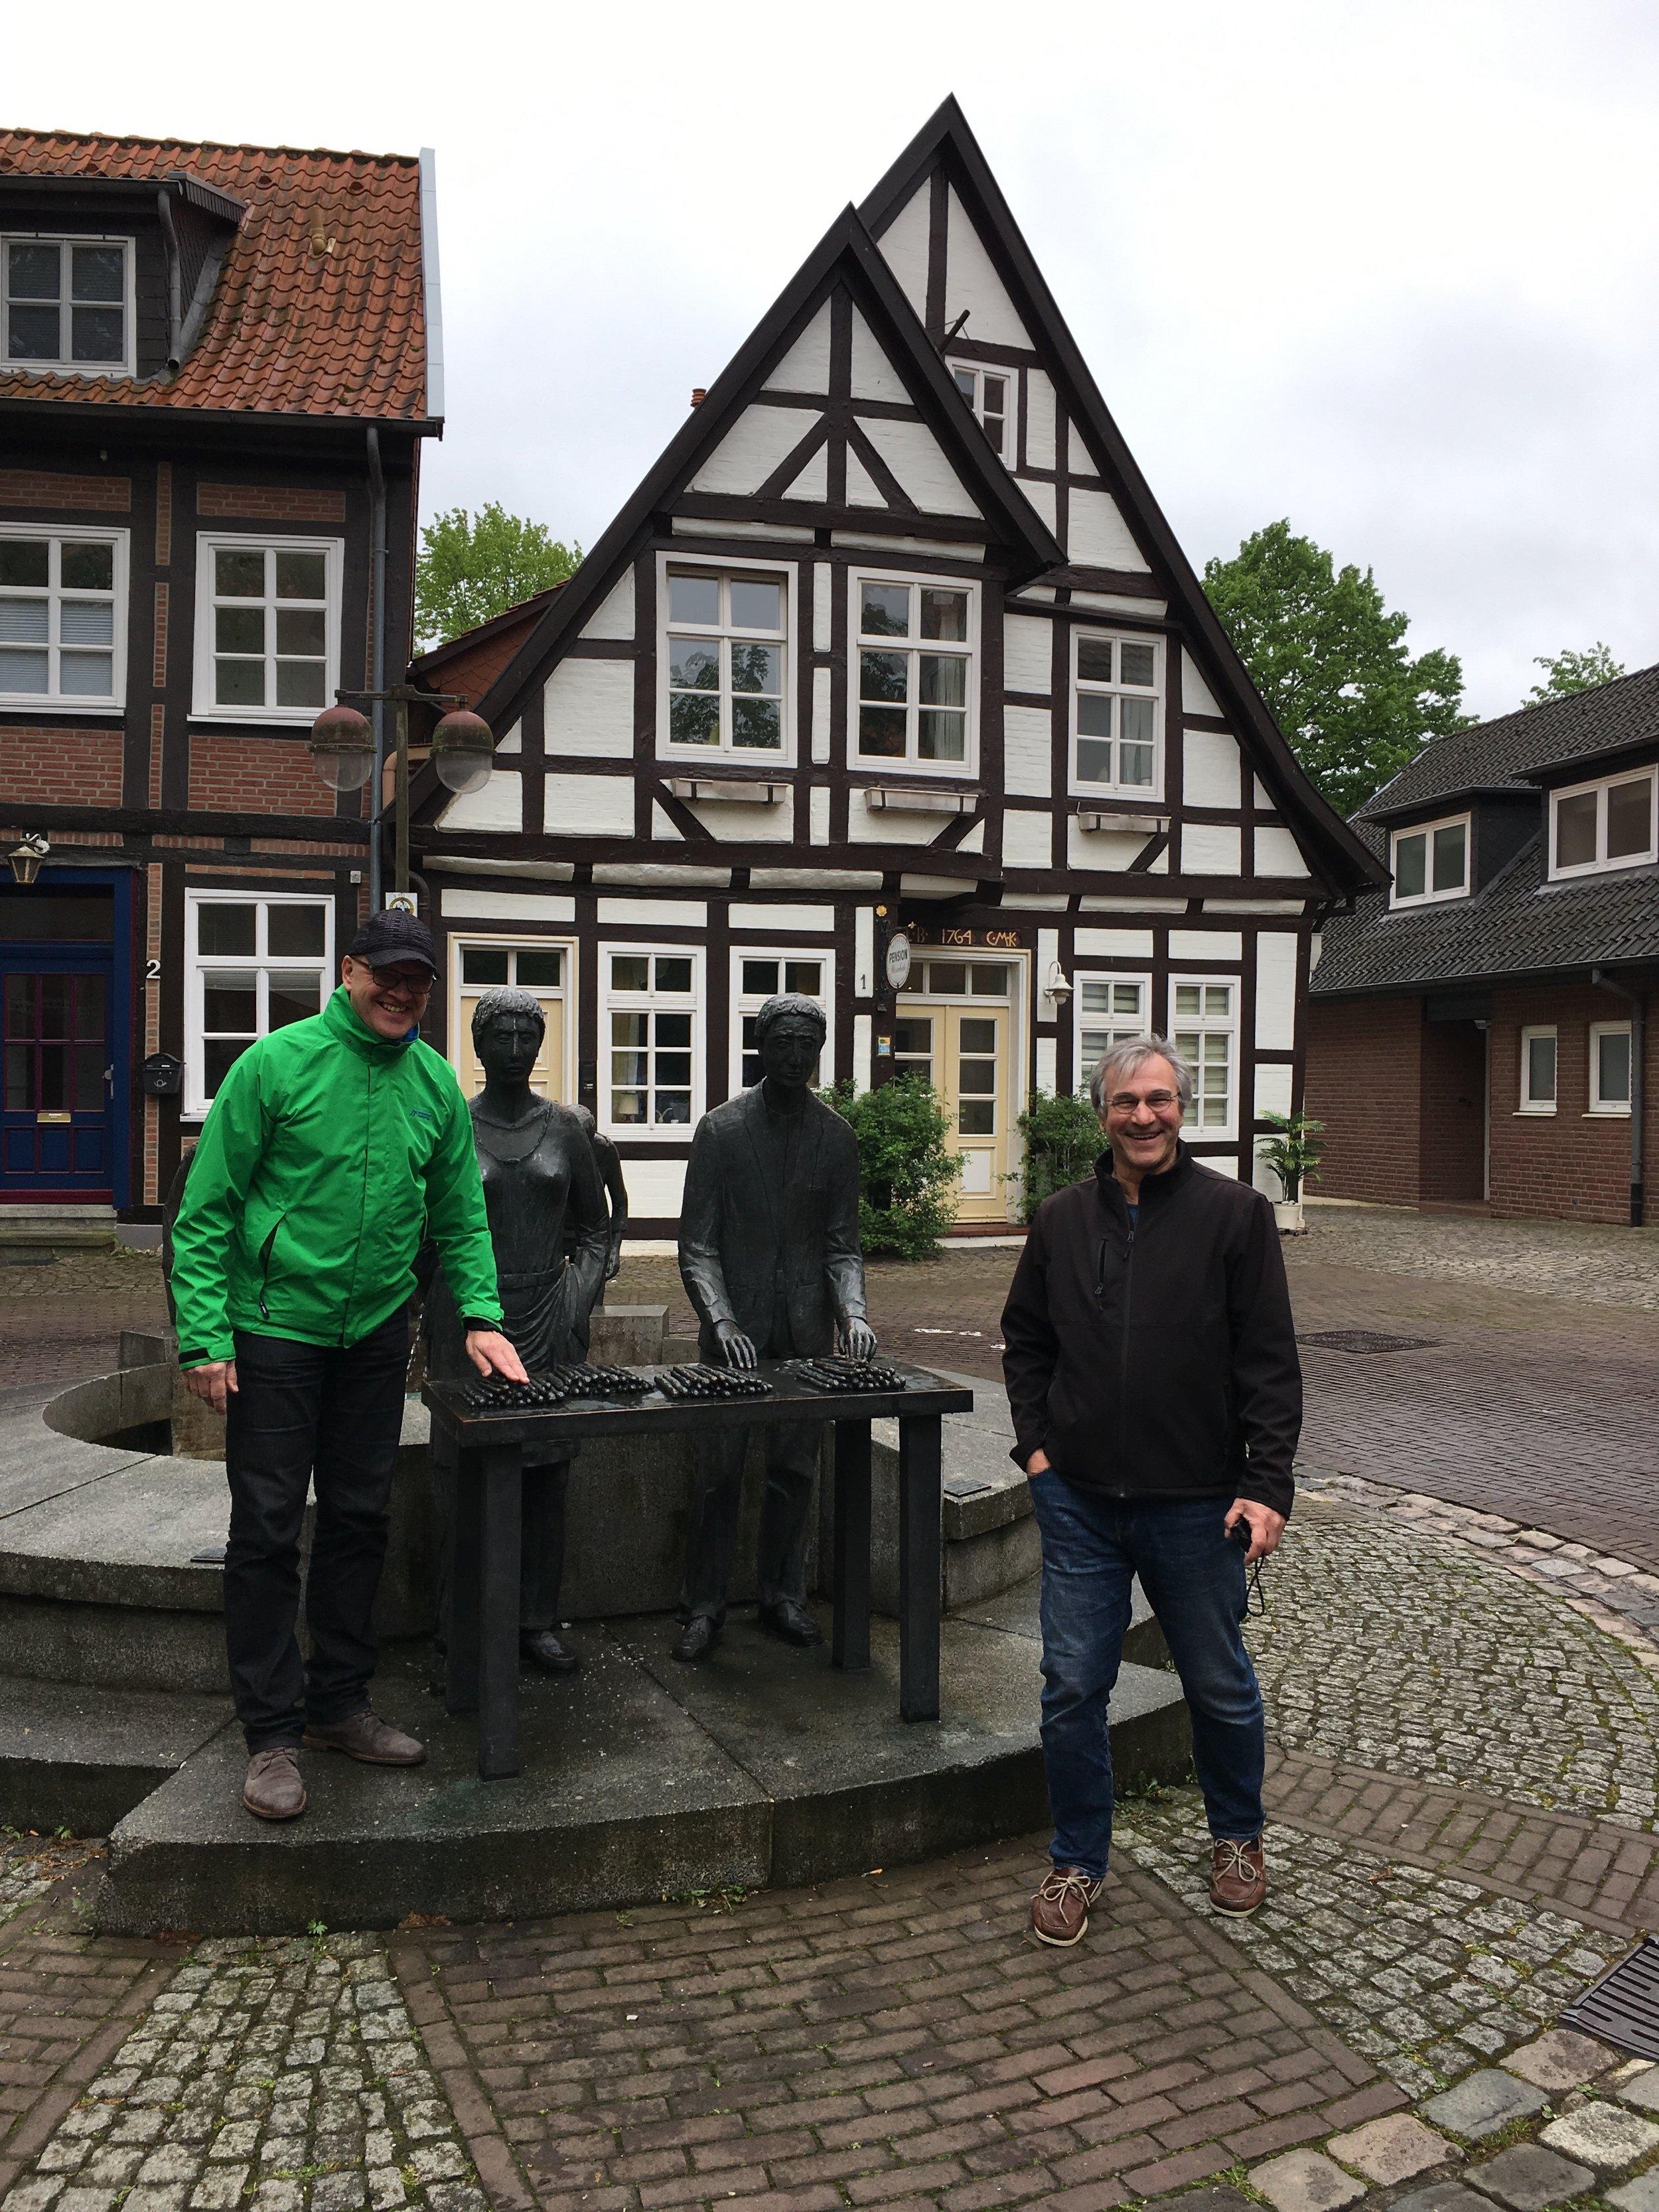 maiwanderfahrt-weser-2019-2_0116_2019-04-29_16-01-39.jpg